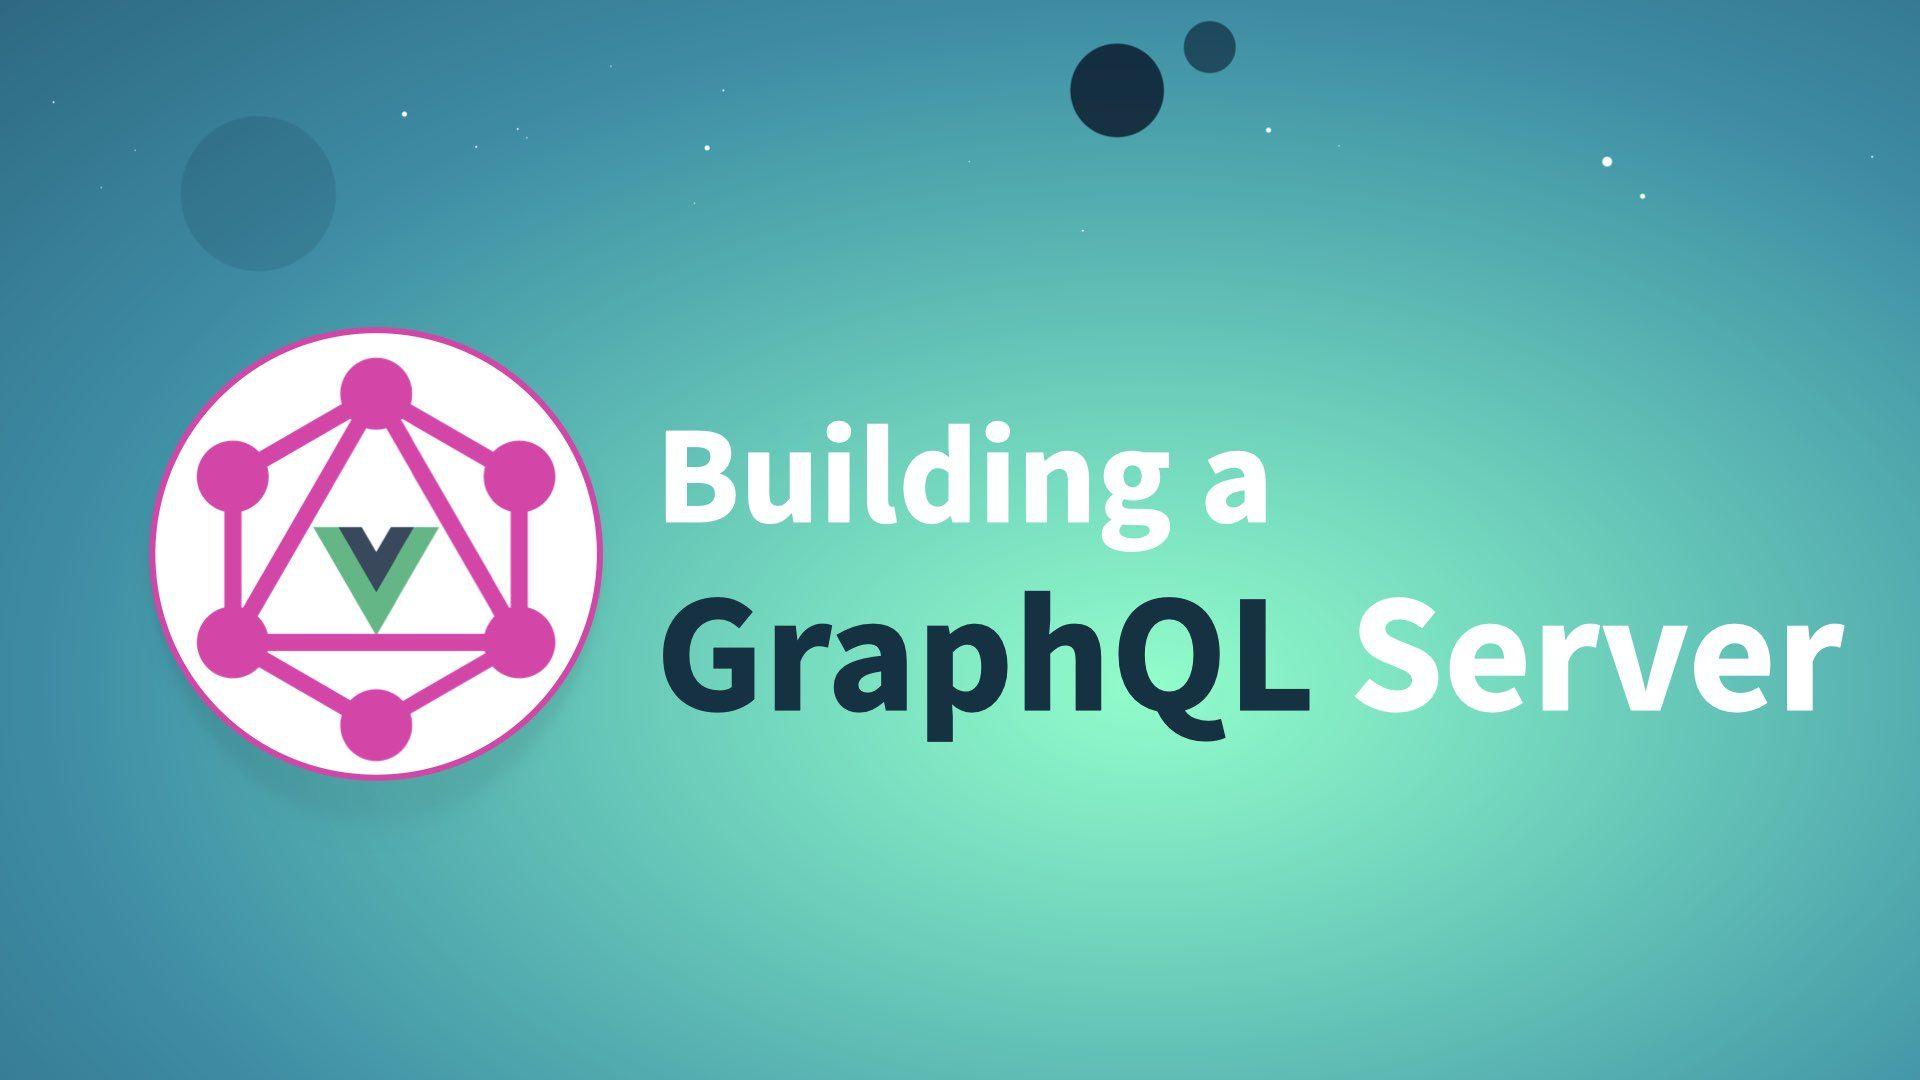 Part 2: Building a GraphQL Server